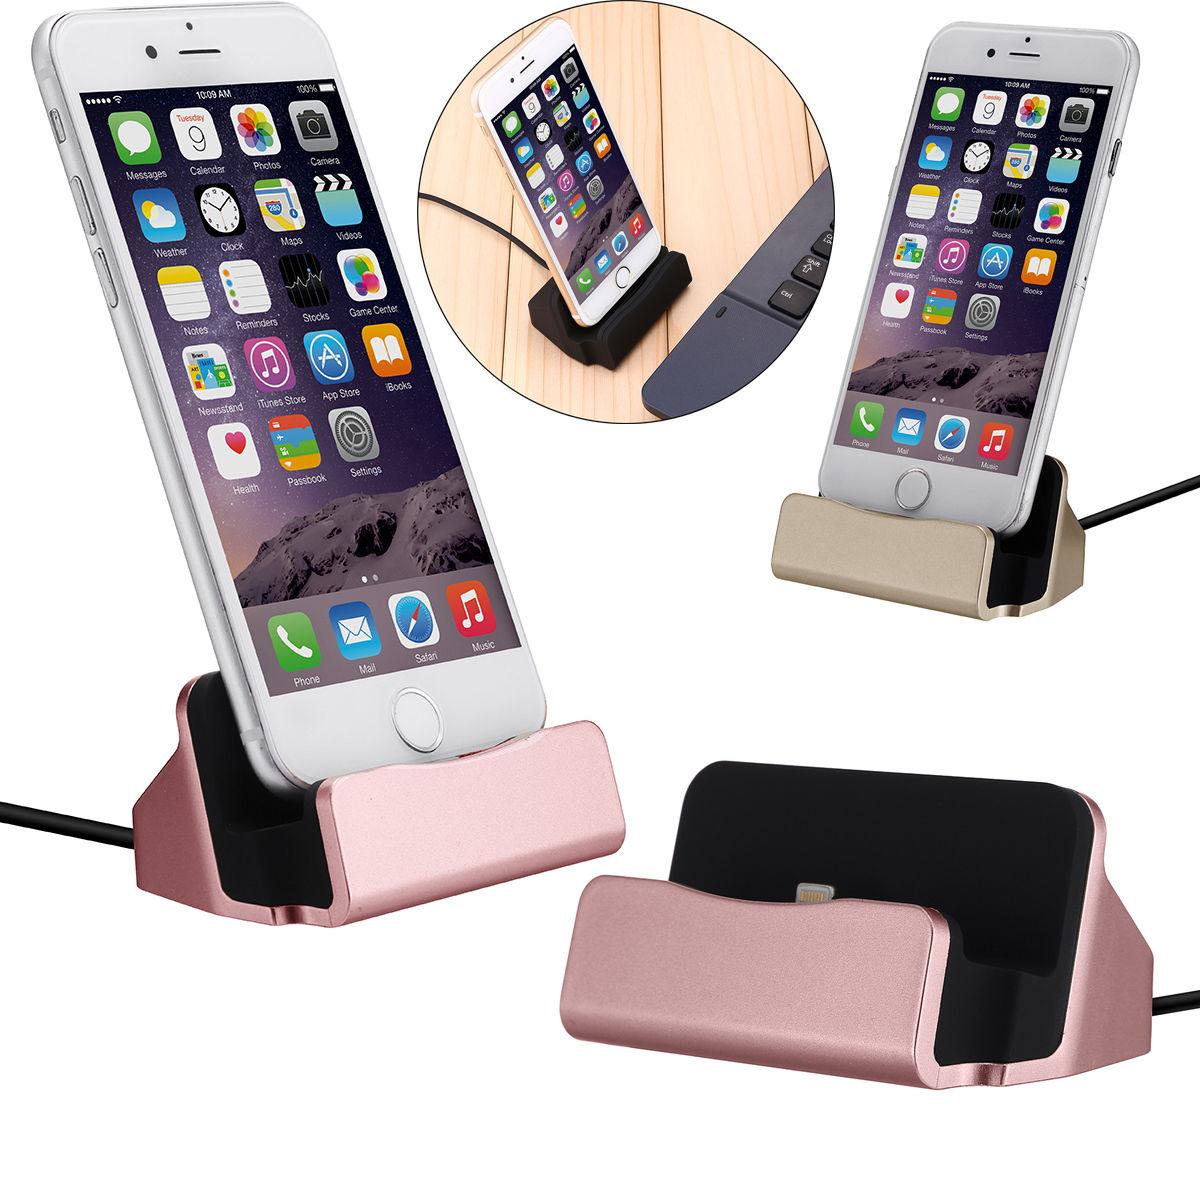 desktop charger stand dock station sync charging cradle for iphone 6s 7 plus 8 x ebay. Black Bedroom Furniture Sets. Home Design Ideas